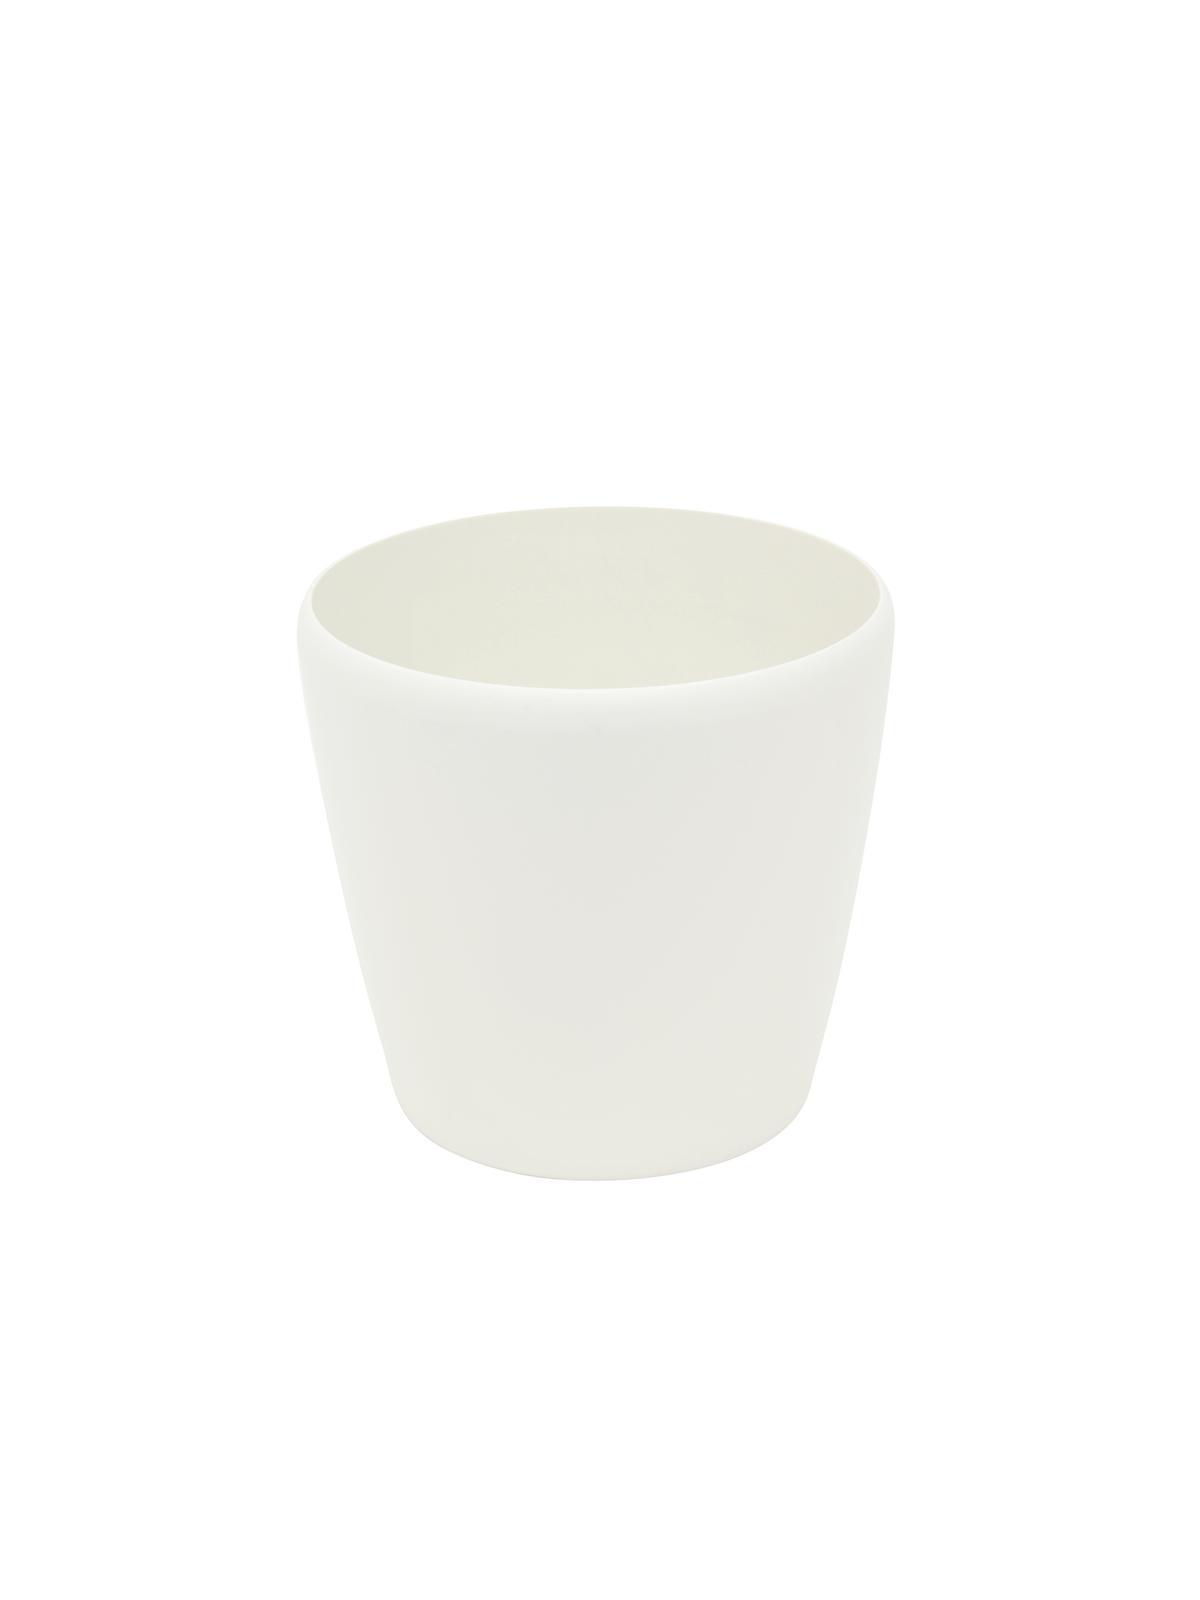 EUROPALMS Deco cachepot LUNA-26, rotondo, bianco